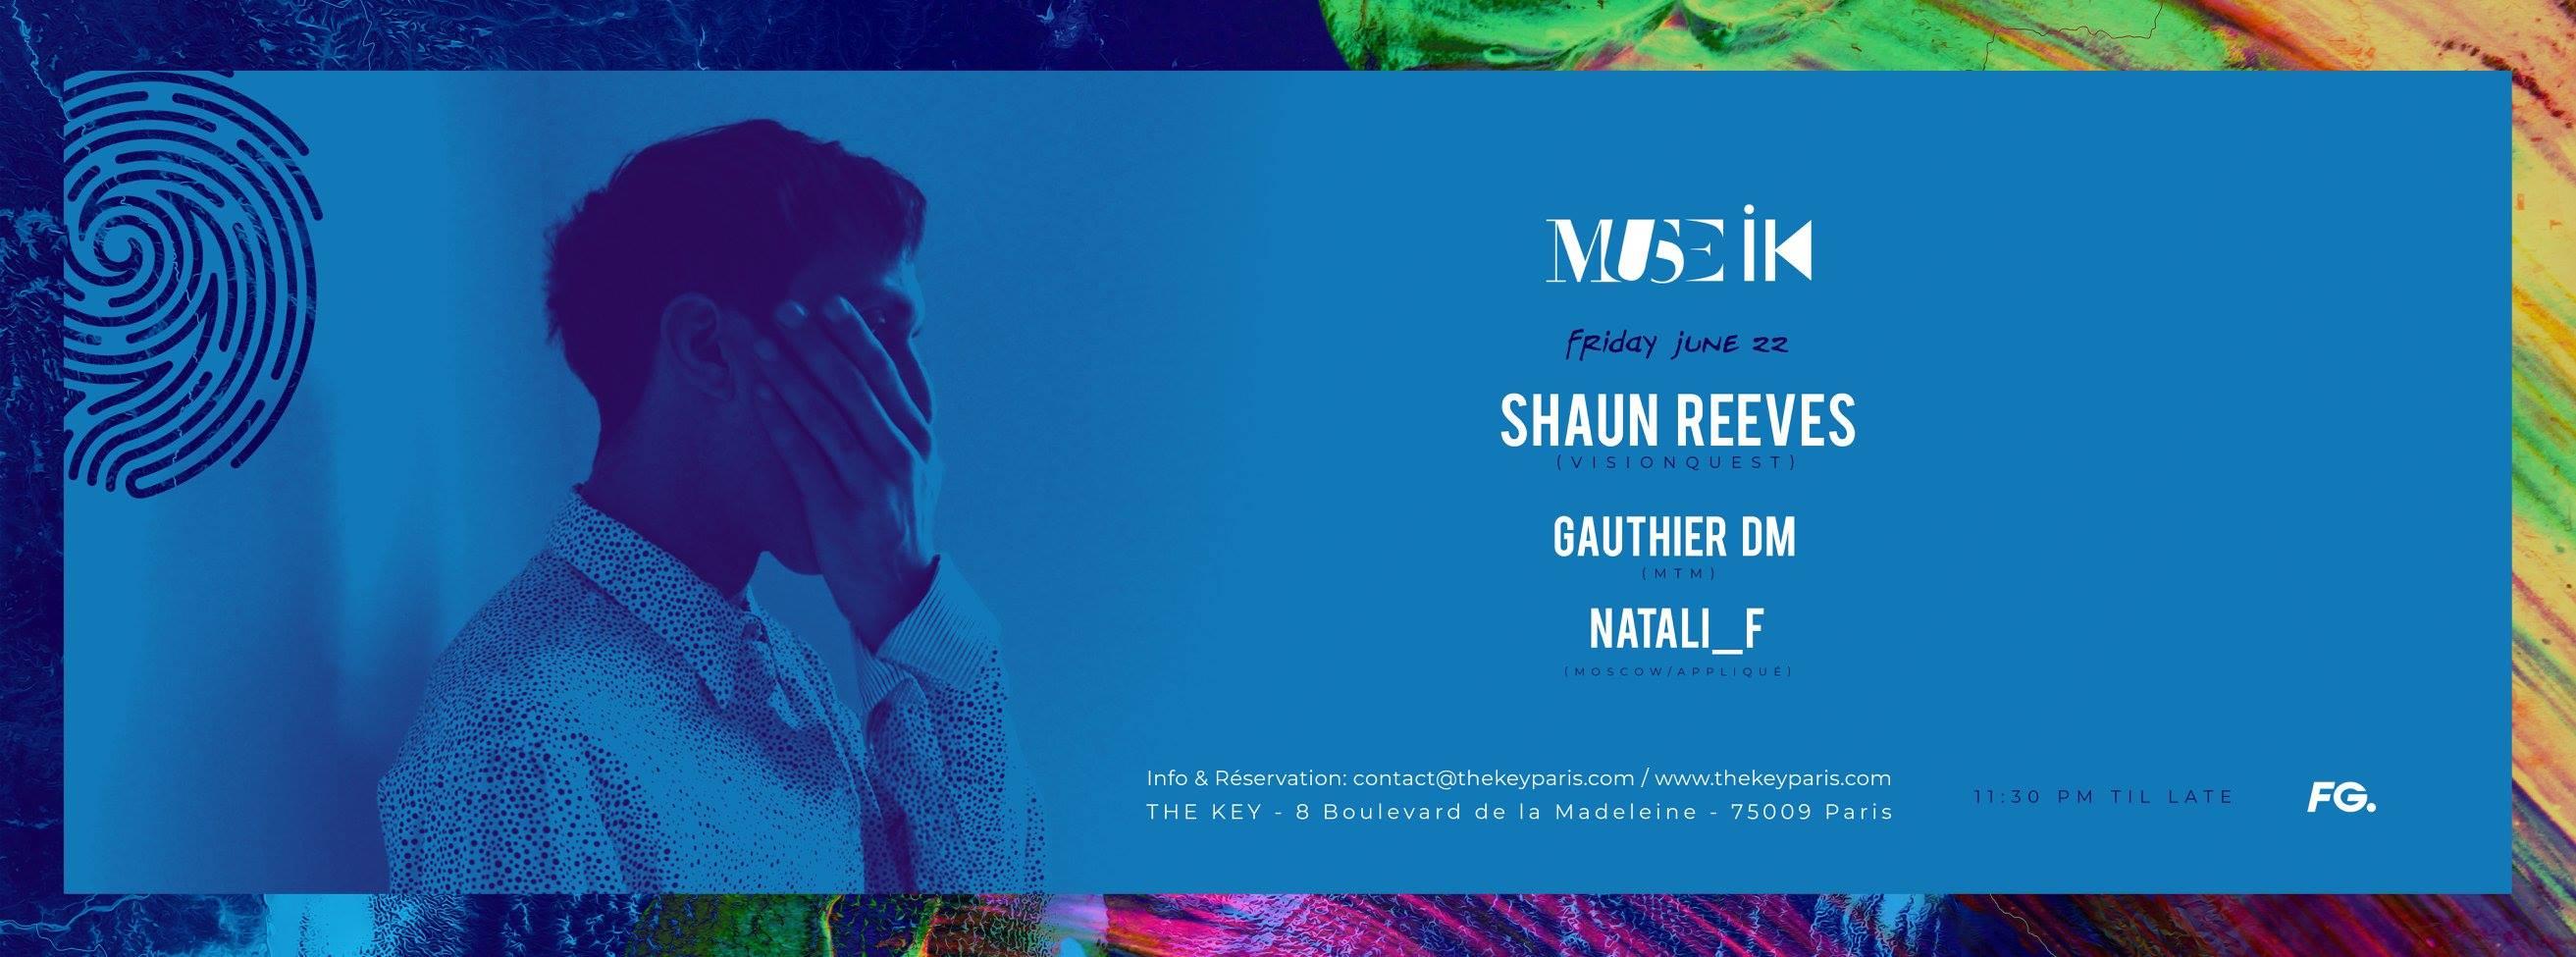 The Key x MUSE IK : Shaun Reeves, Gauthier DM, Natali_F